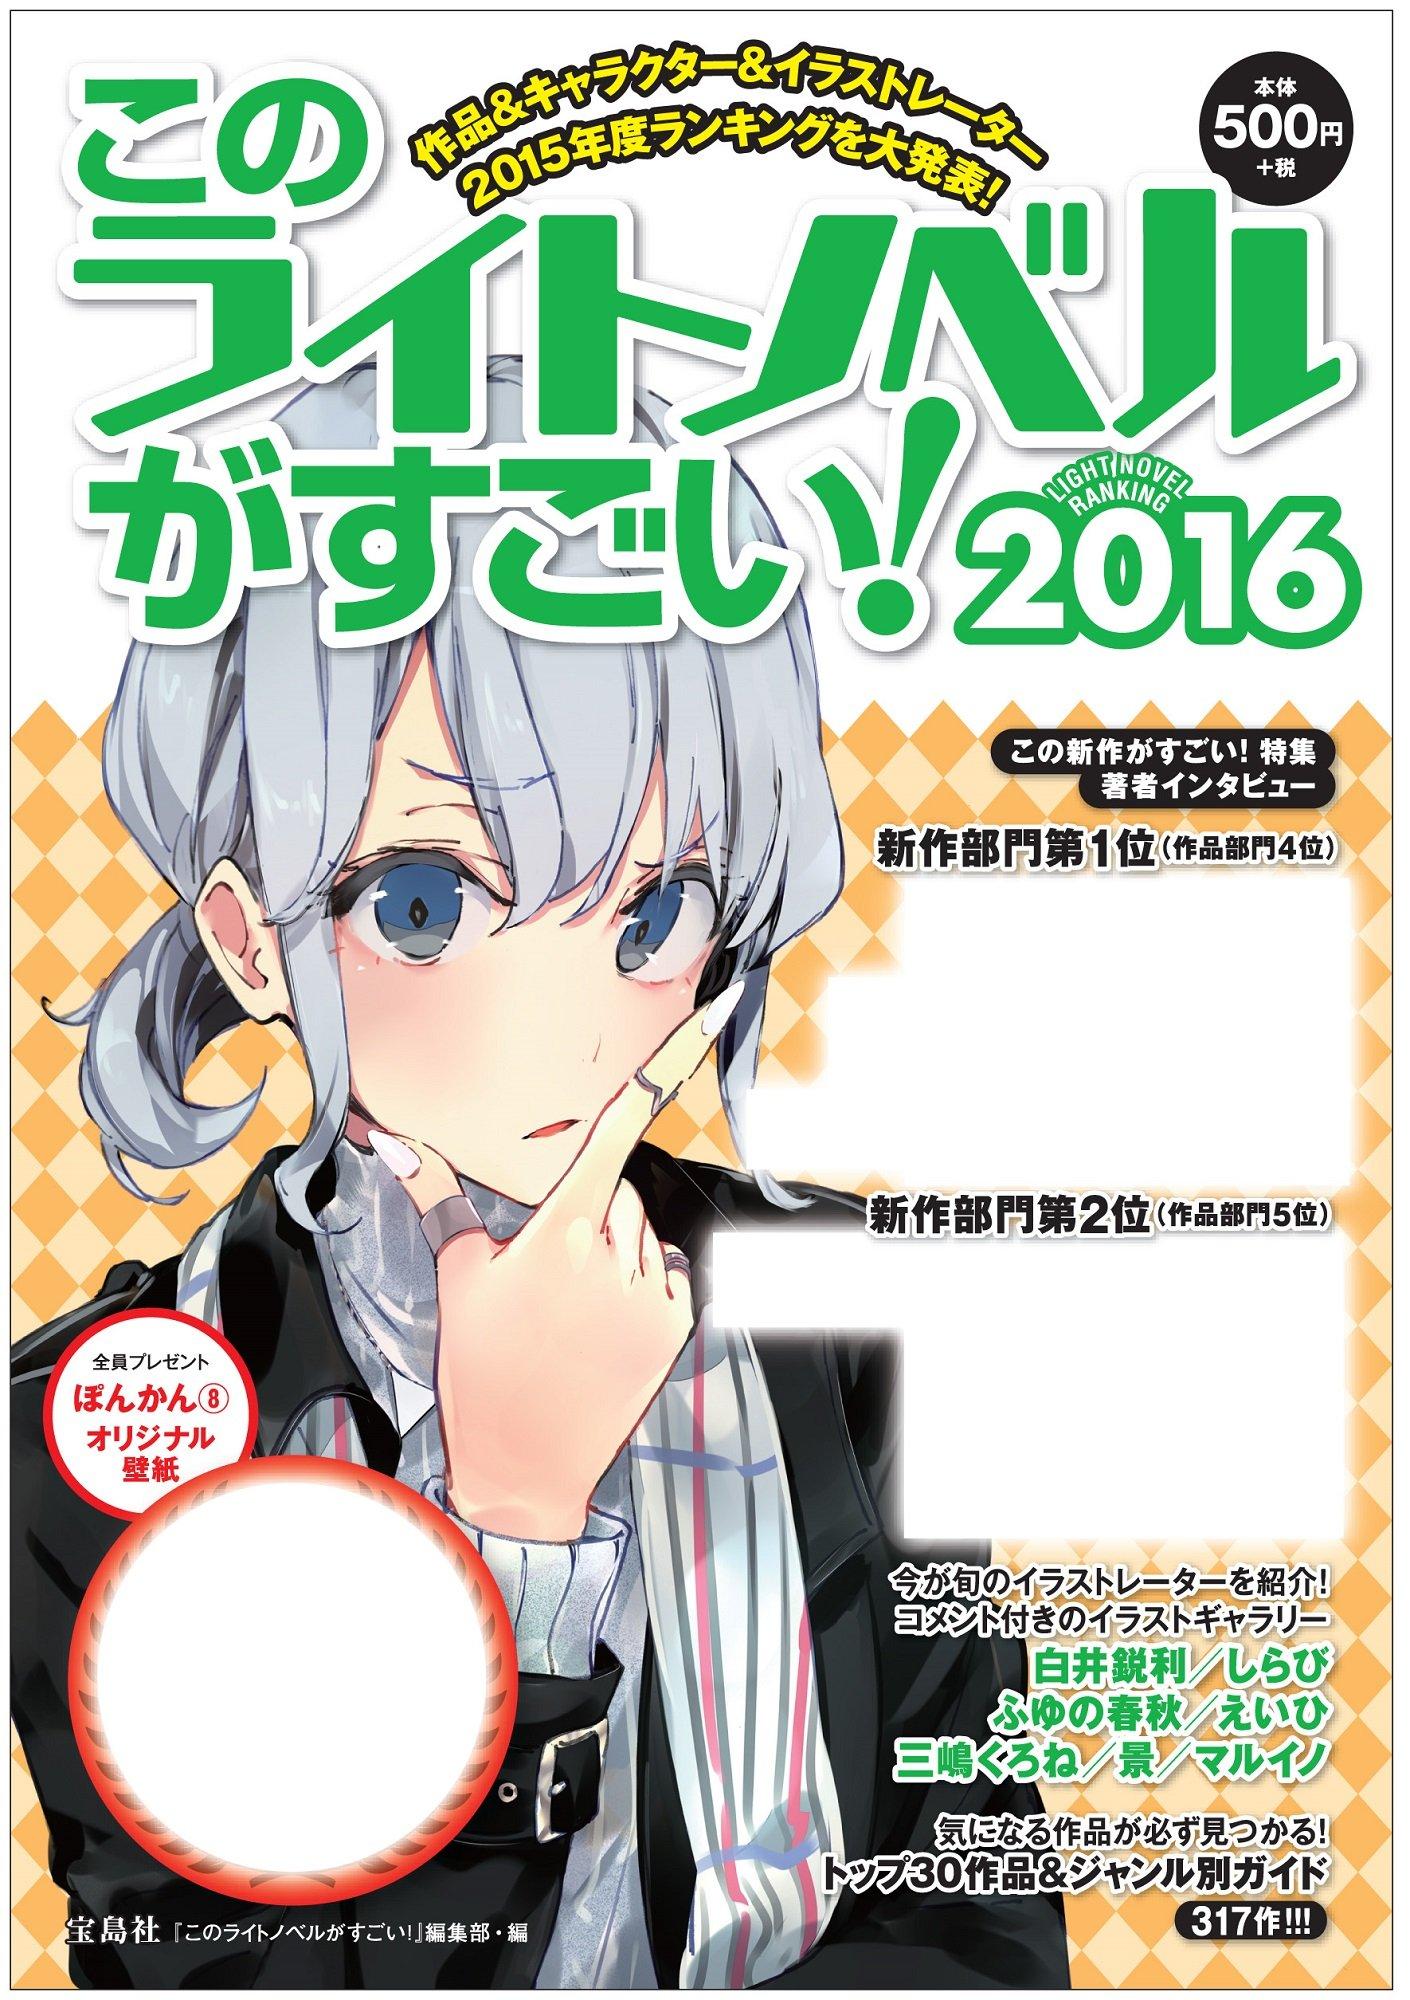 Oregairu Dominates Kono Light Novel Ga Sugoi! For a Third Year in a Row